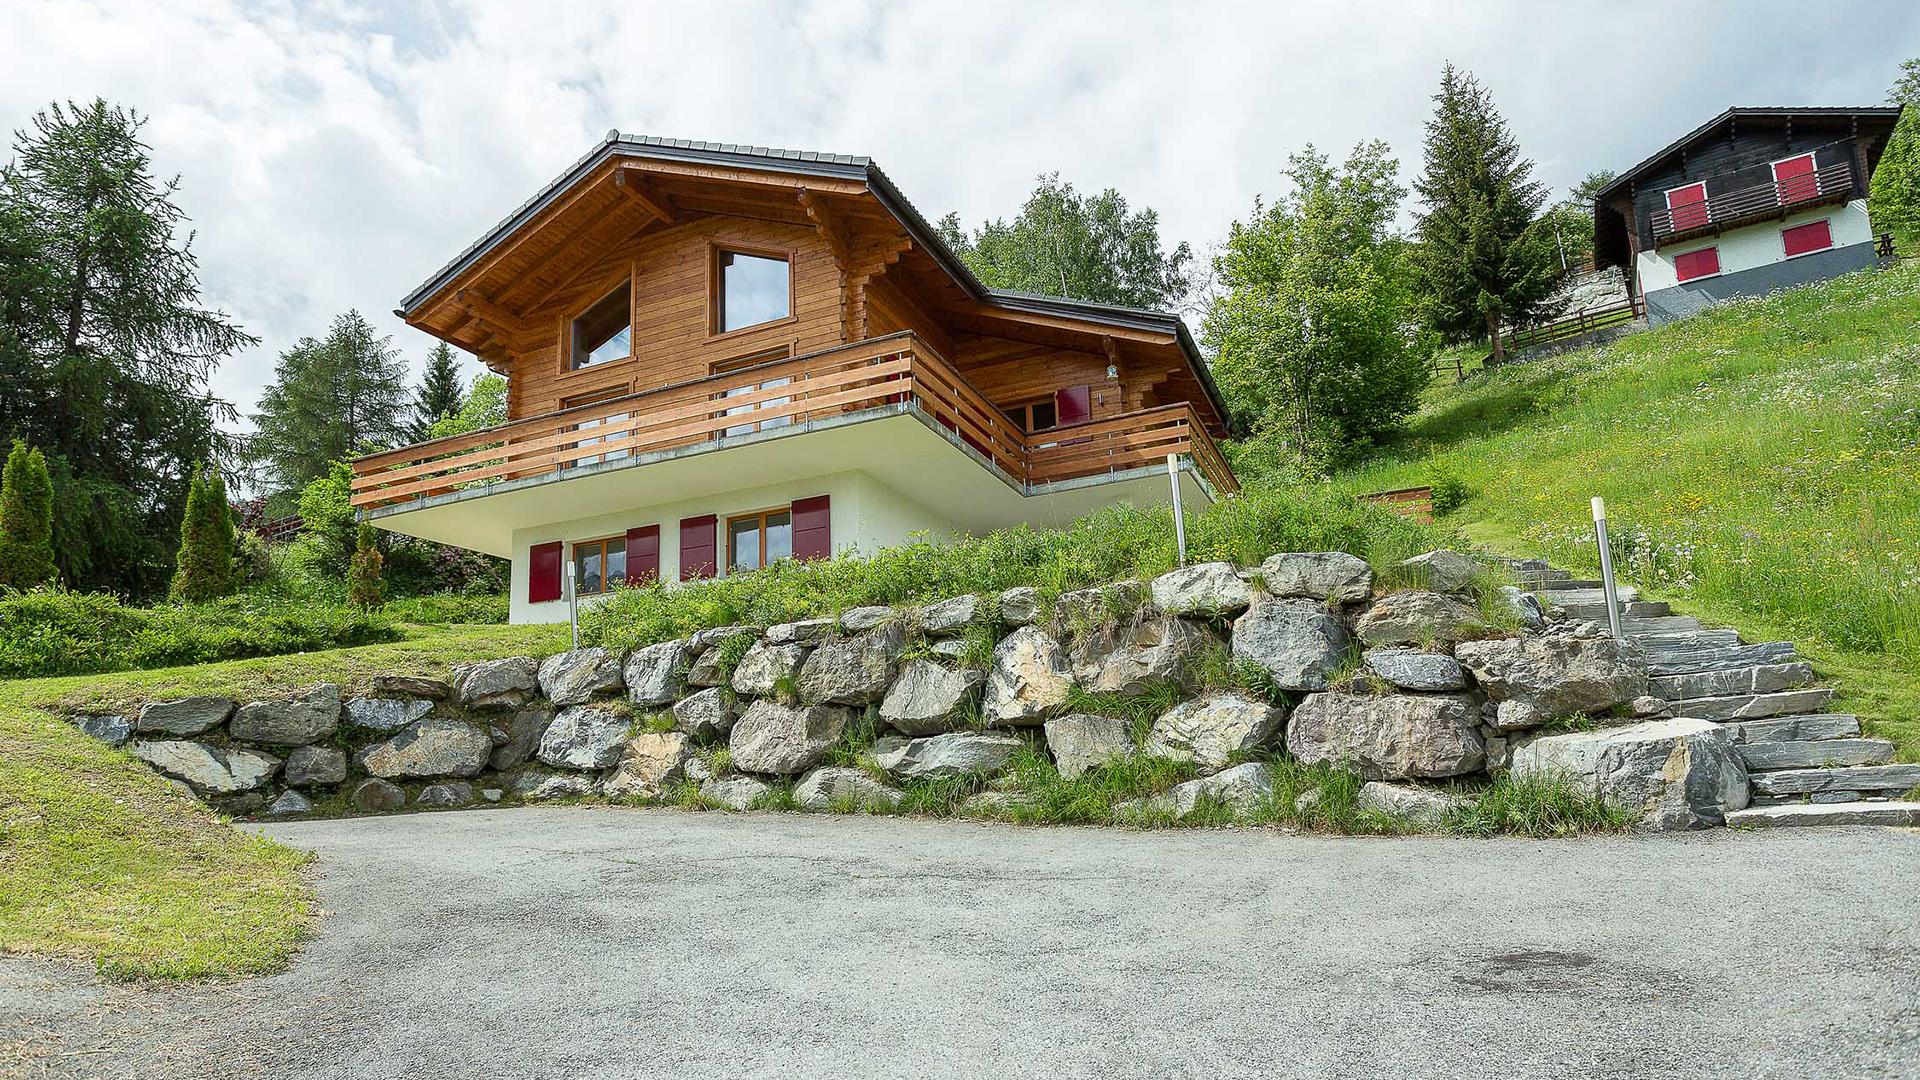 Les Crus Chalet, Switzerland